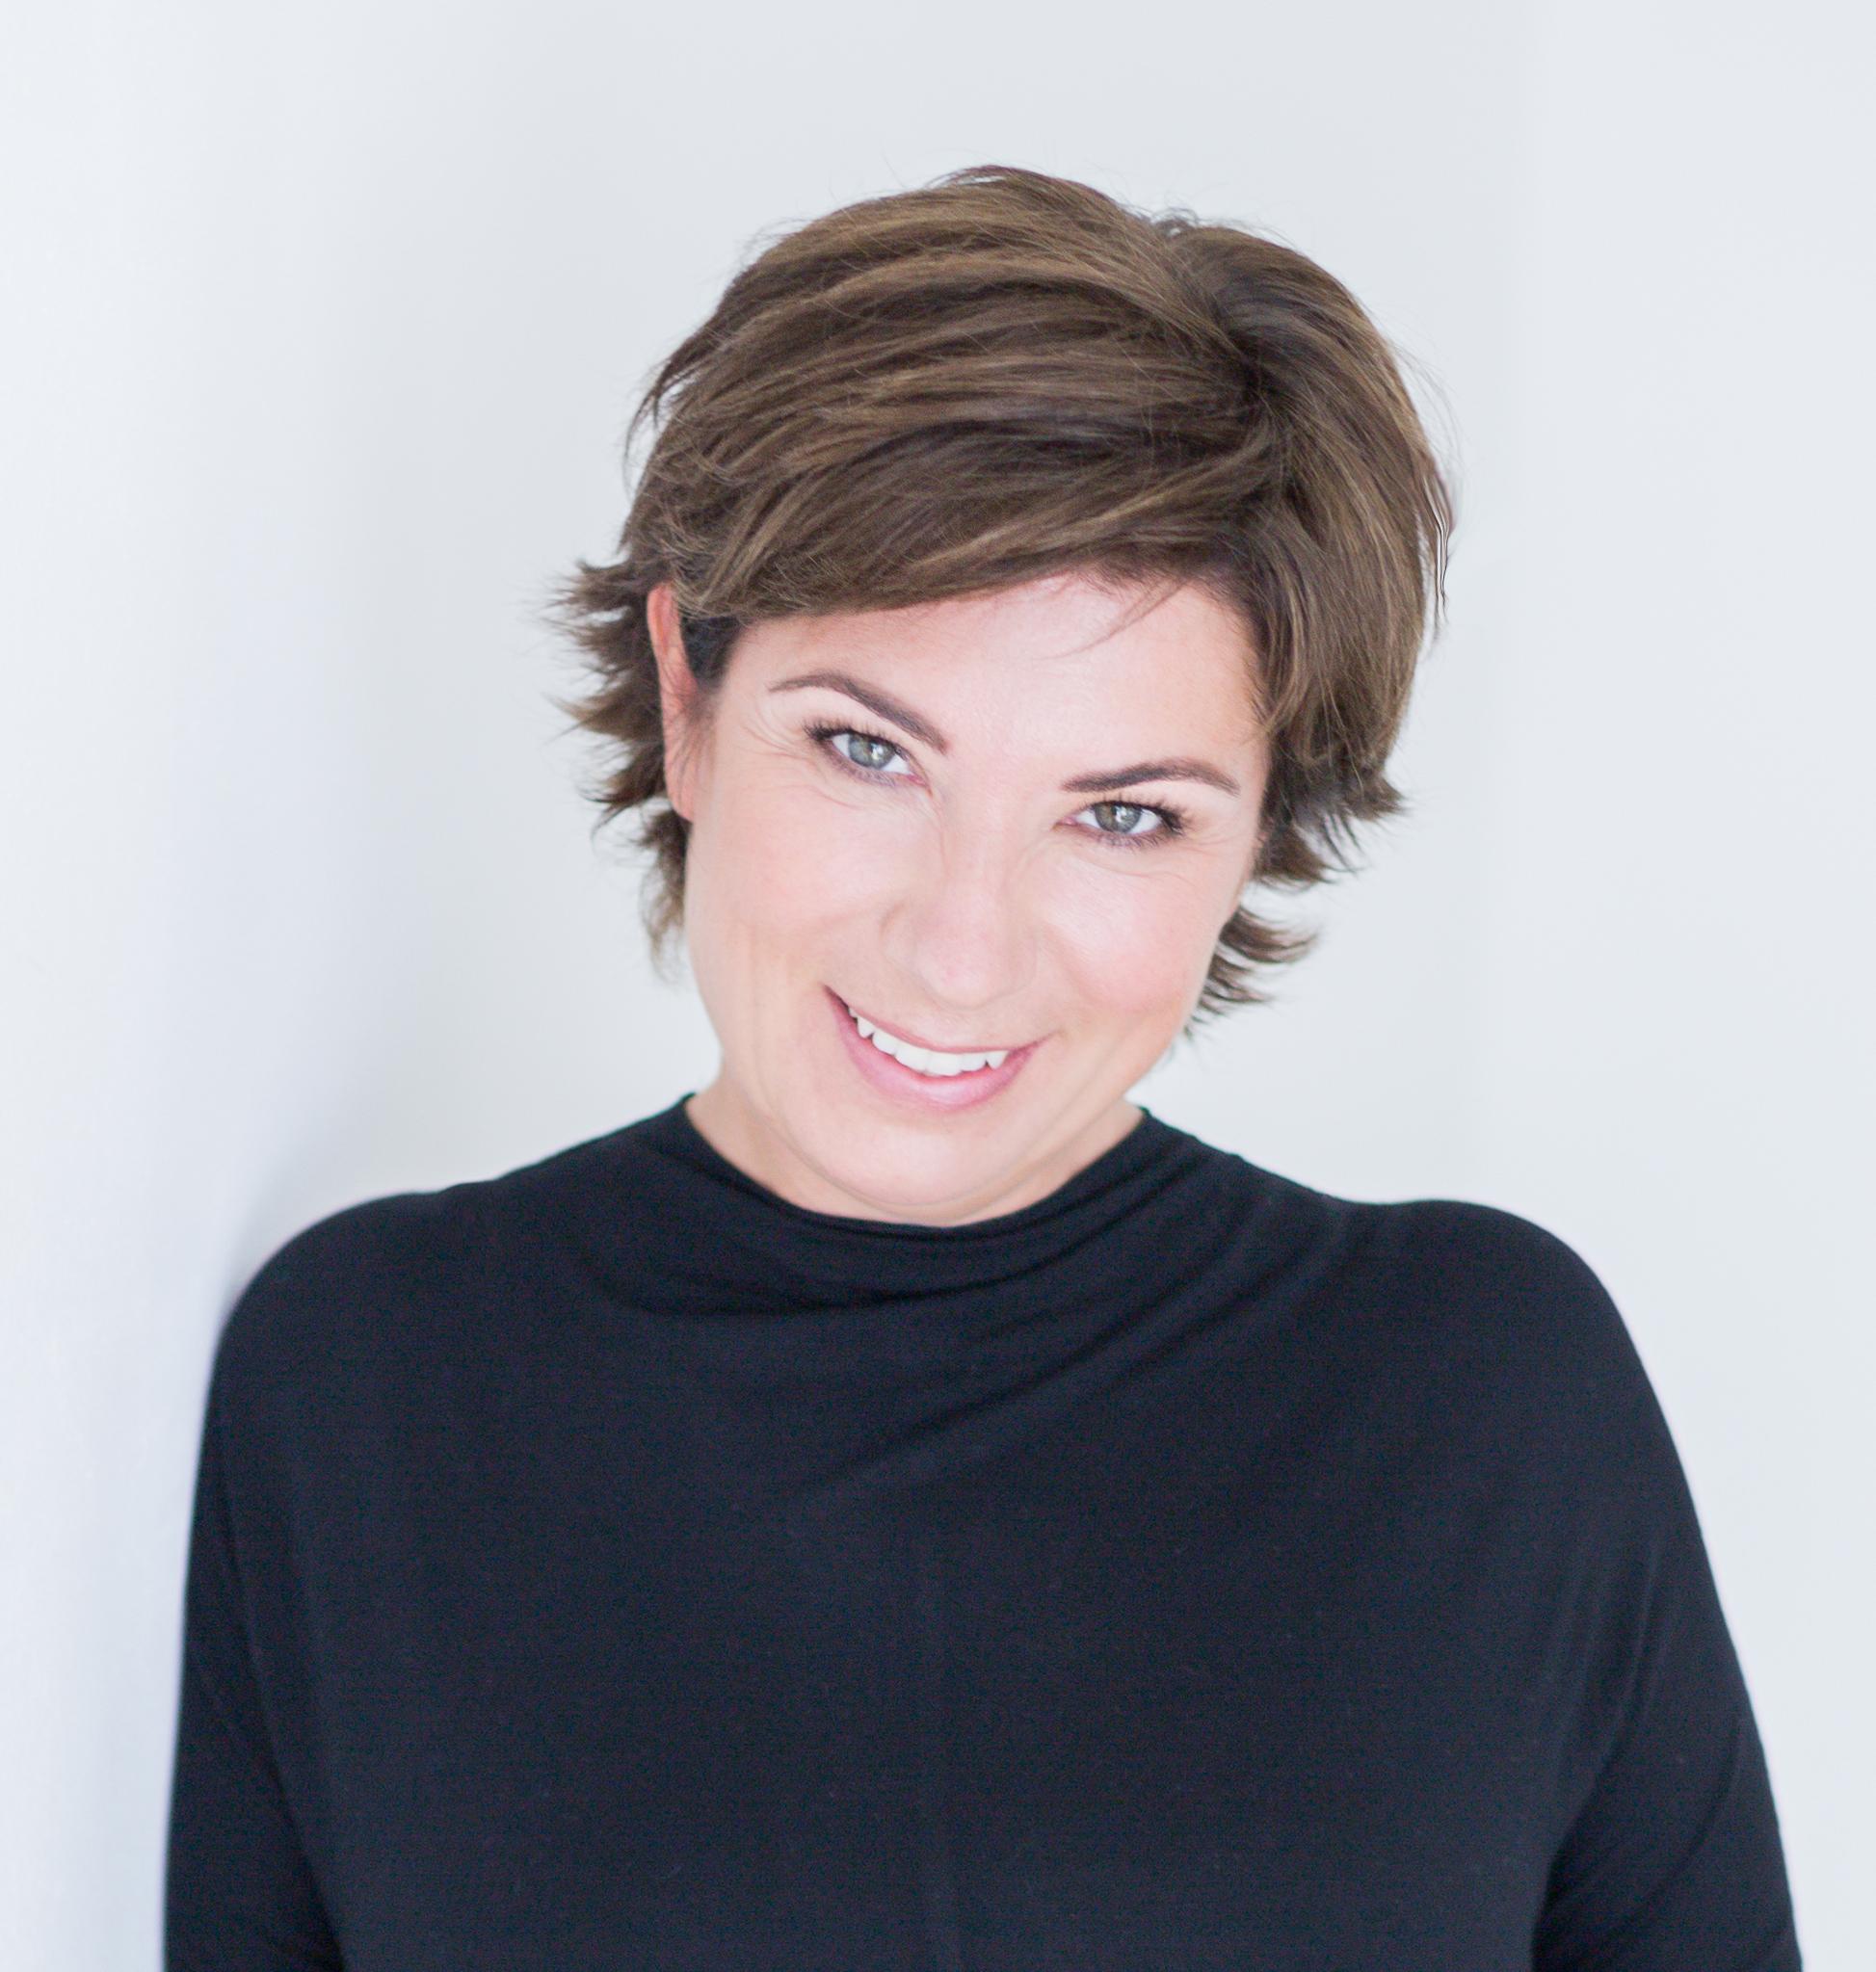 Andrea von Bonin